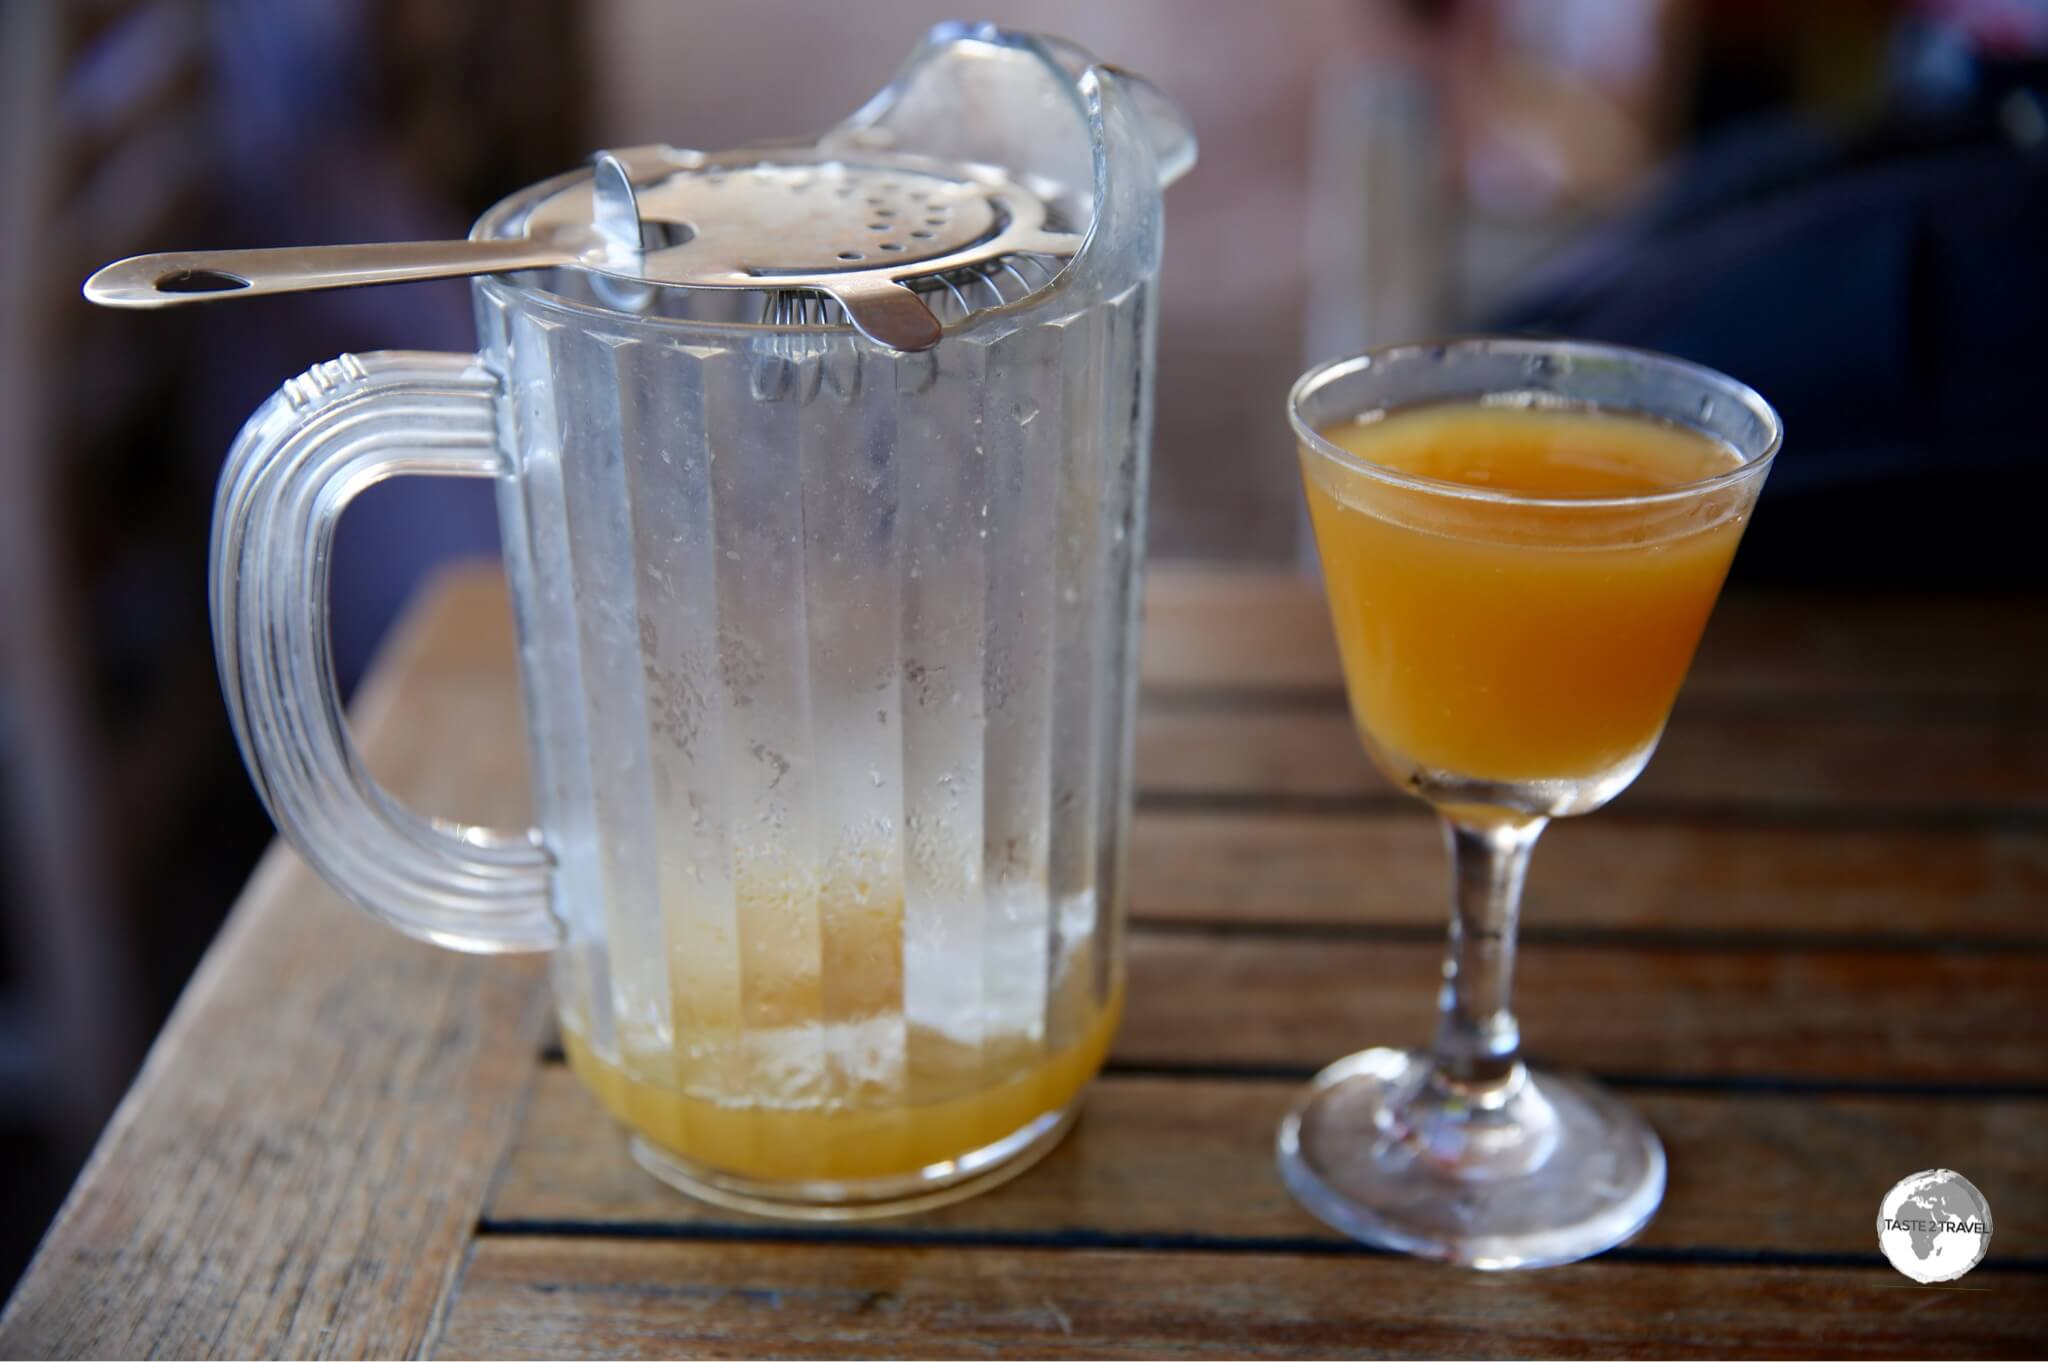 A Rum Swizzle at the Swizzle Inn.